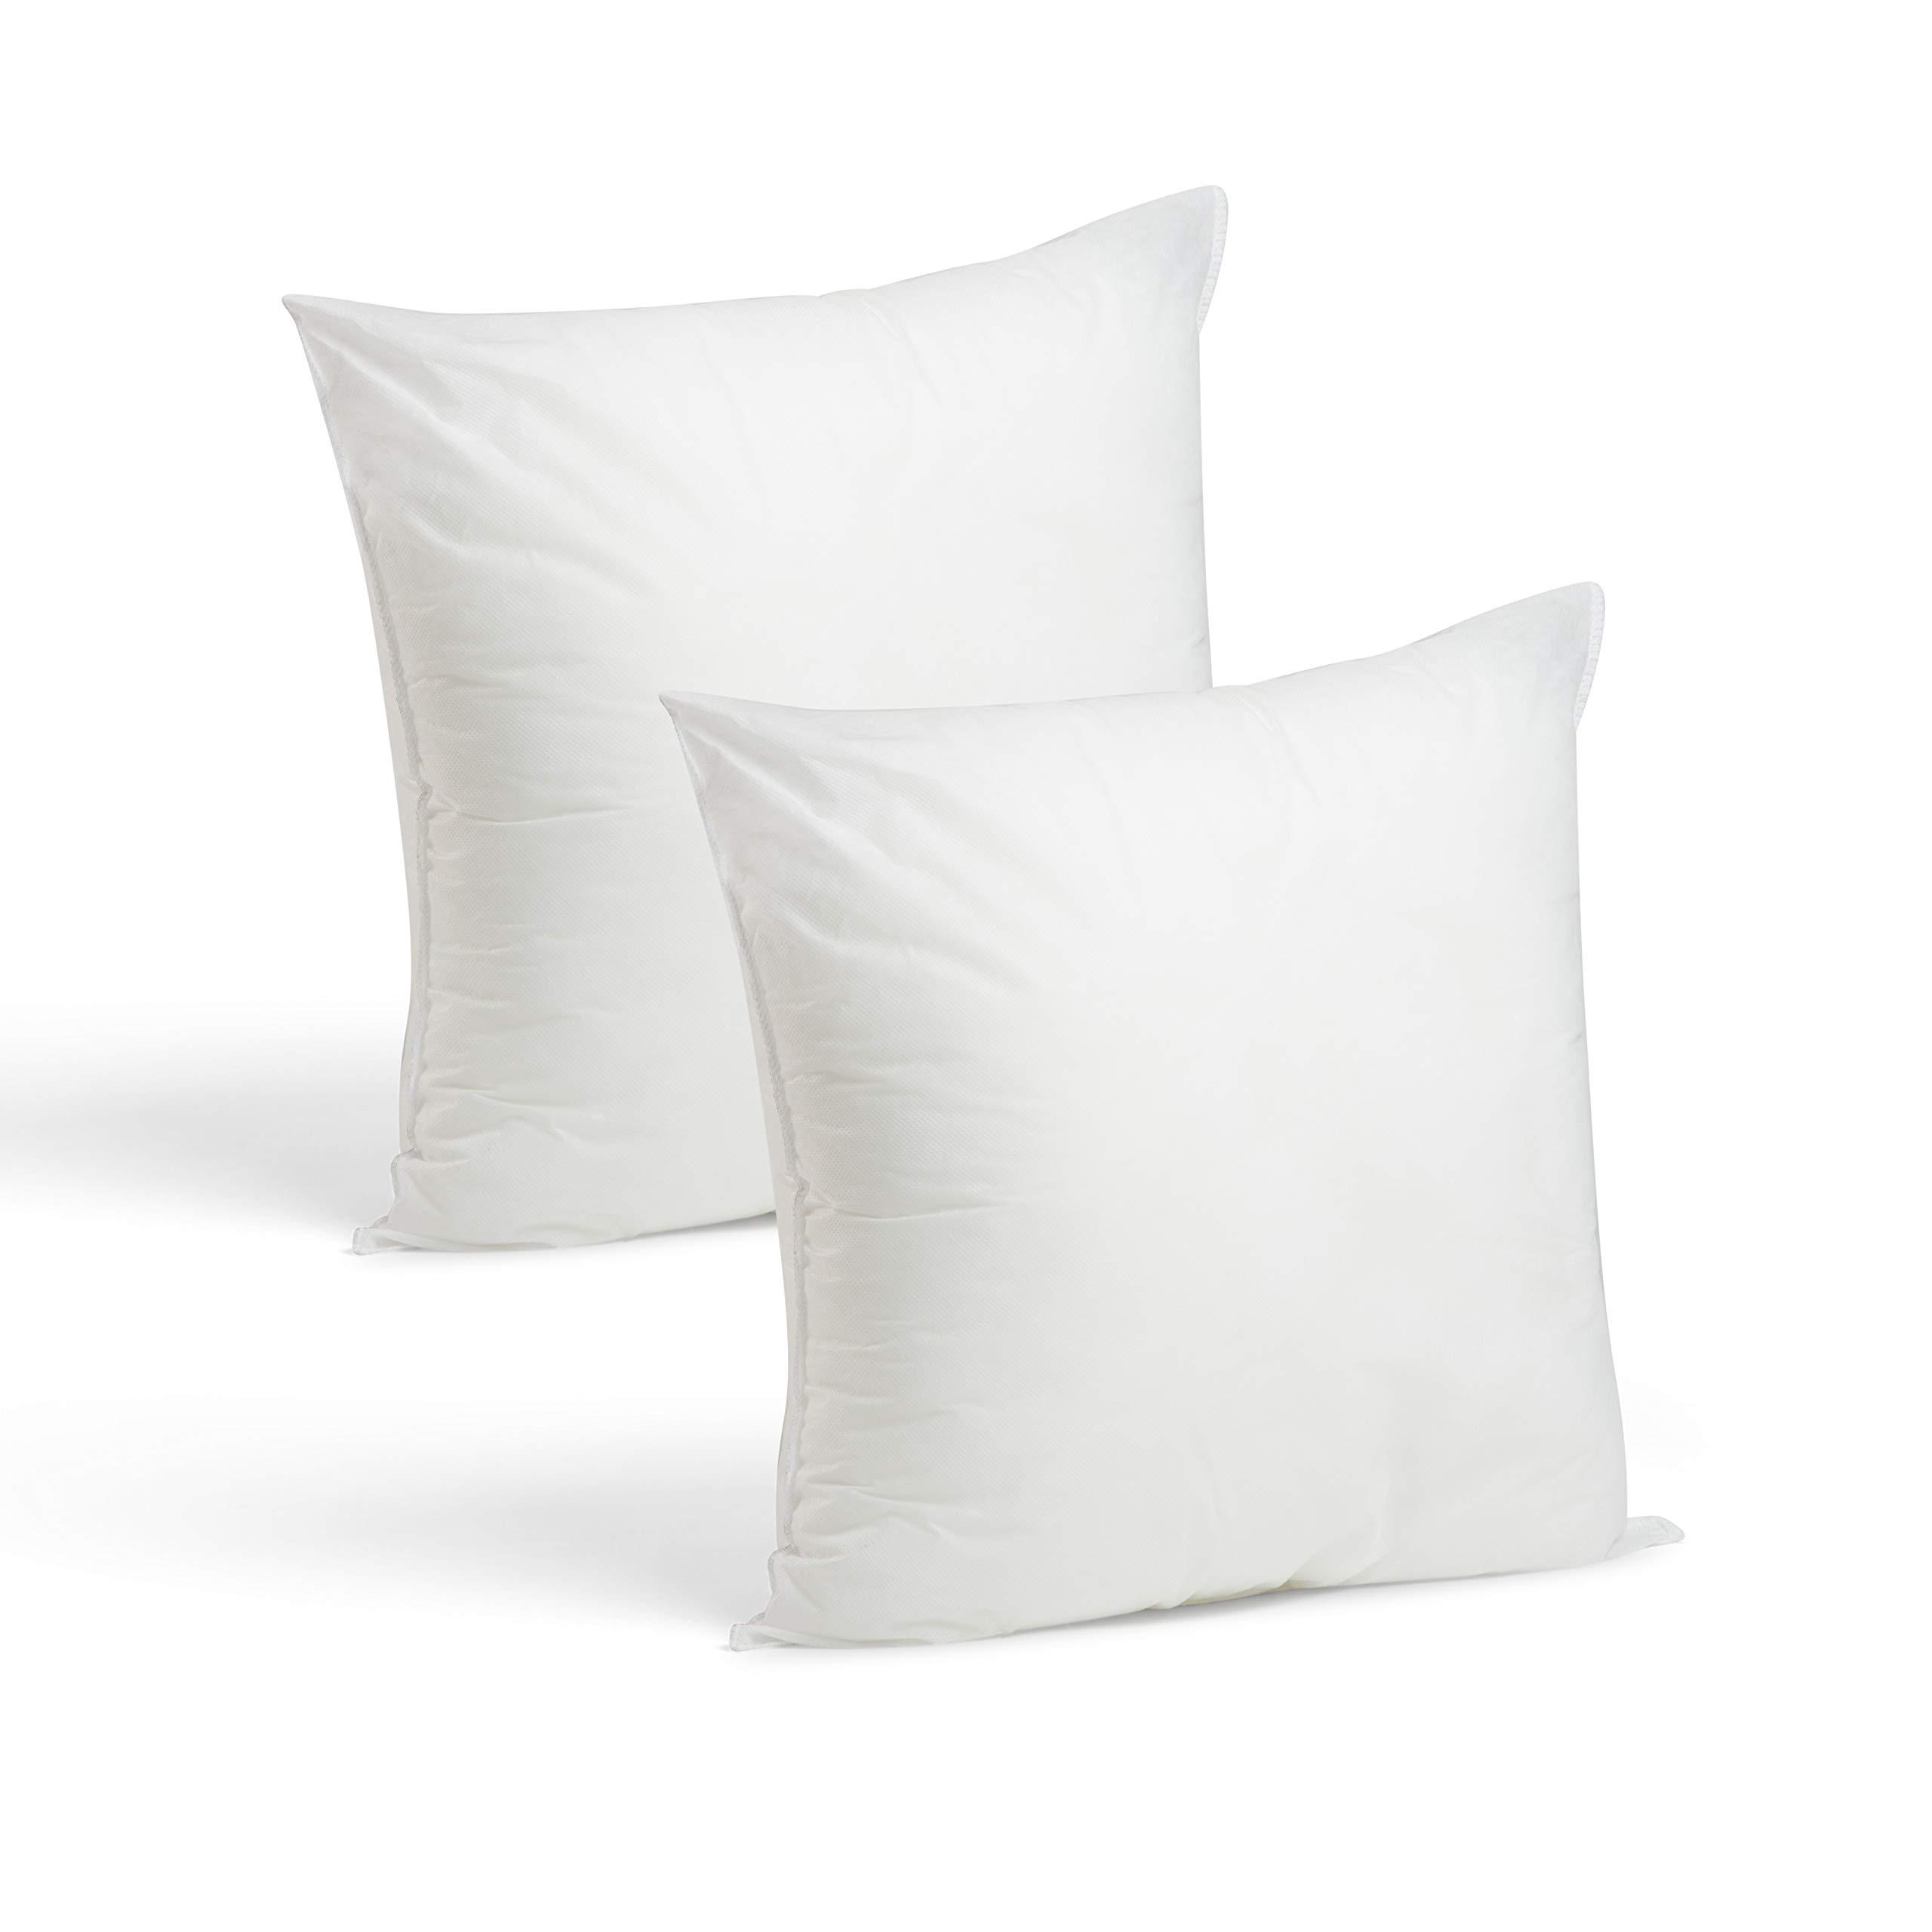 Set Of 2 18 X 18 Premium Hypoallergenic Stuffer Pillow Insert Sham Square Form Polyester Standard White Made In Usa Home Kitchen